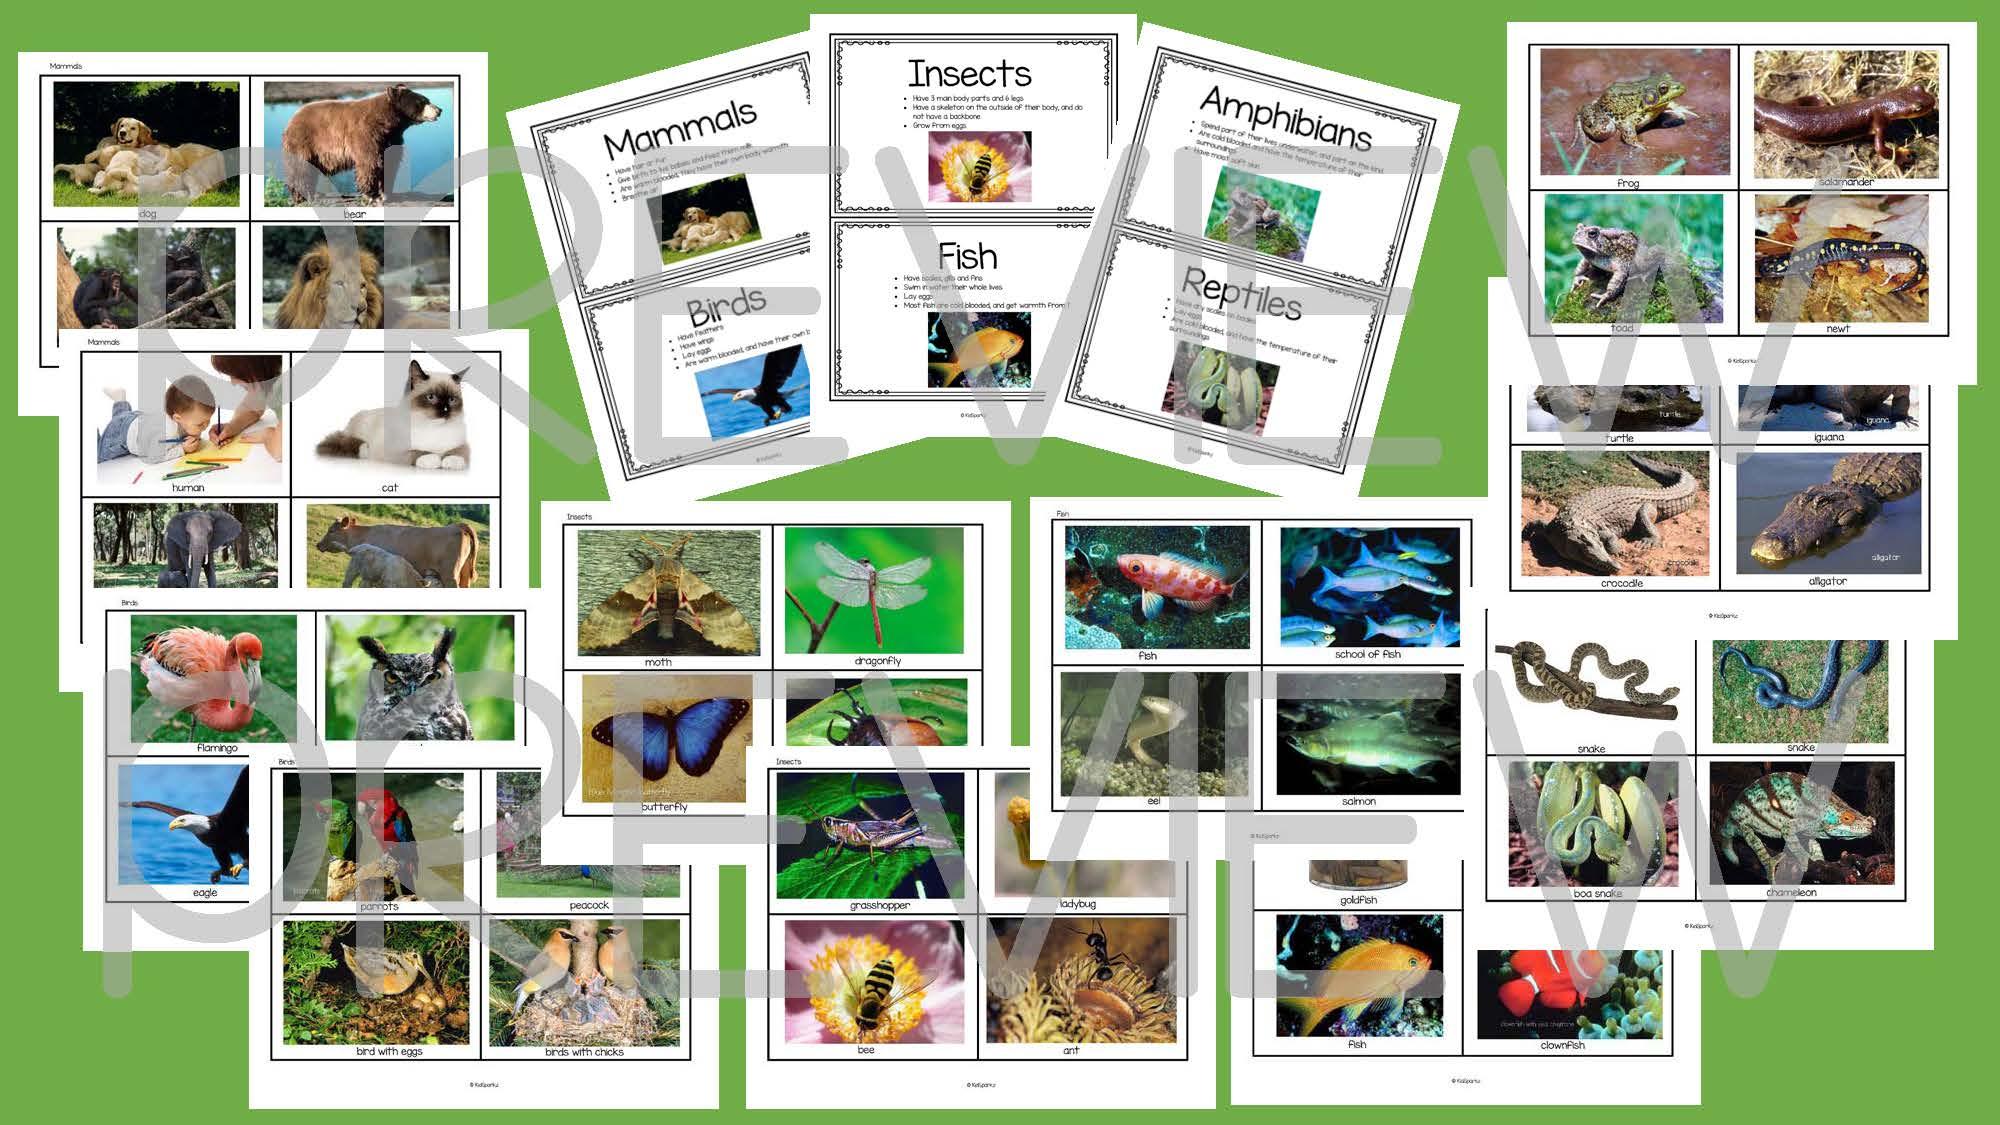 Categorizing 6 Animal Classes